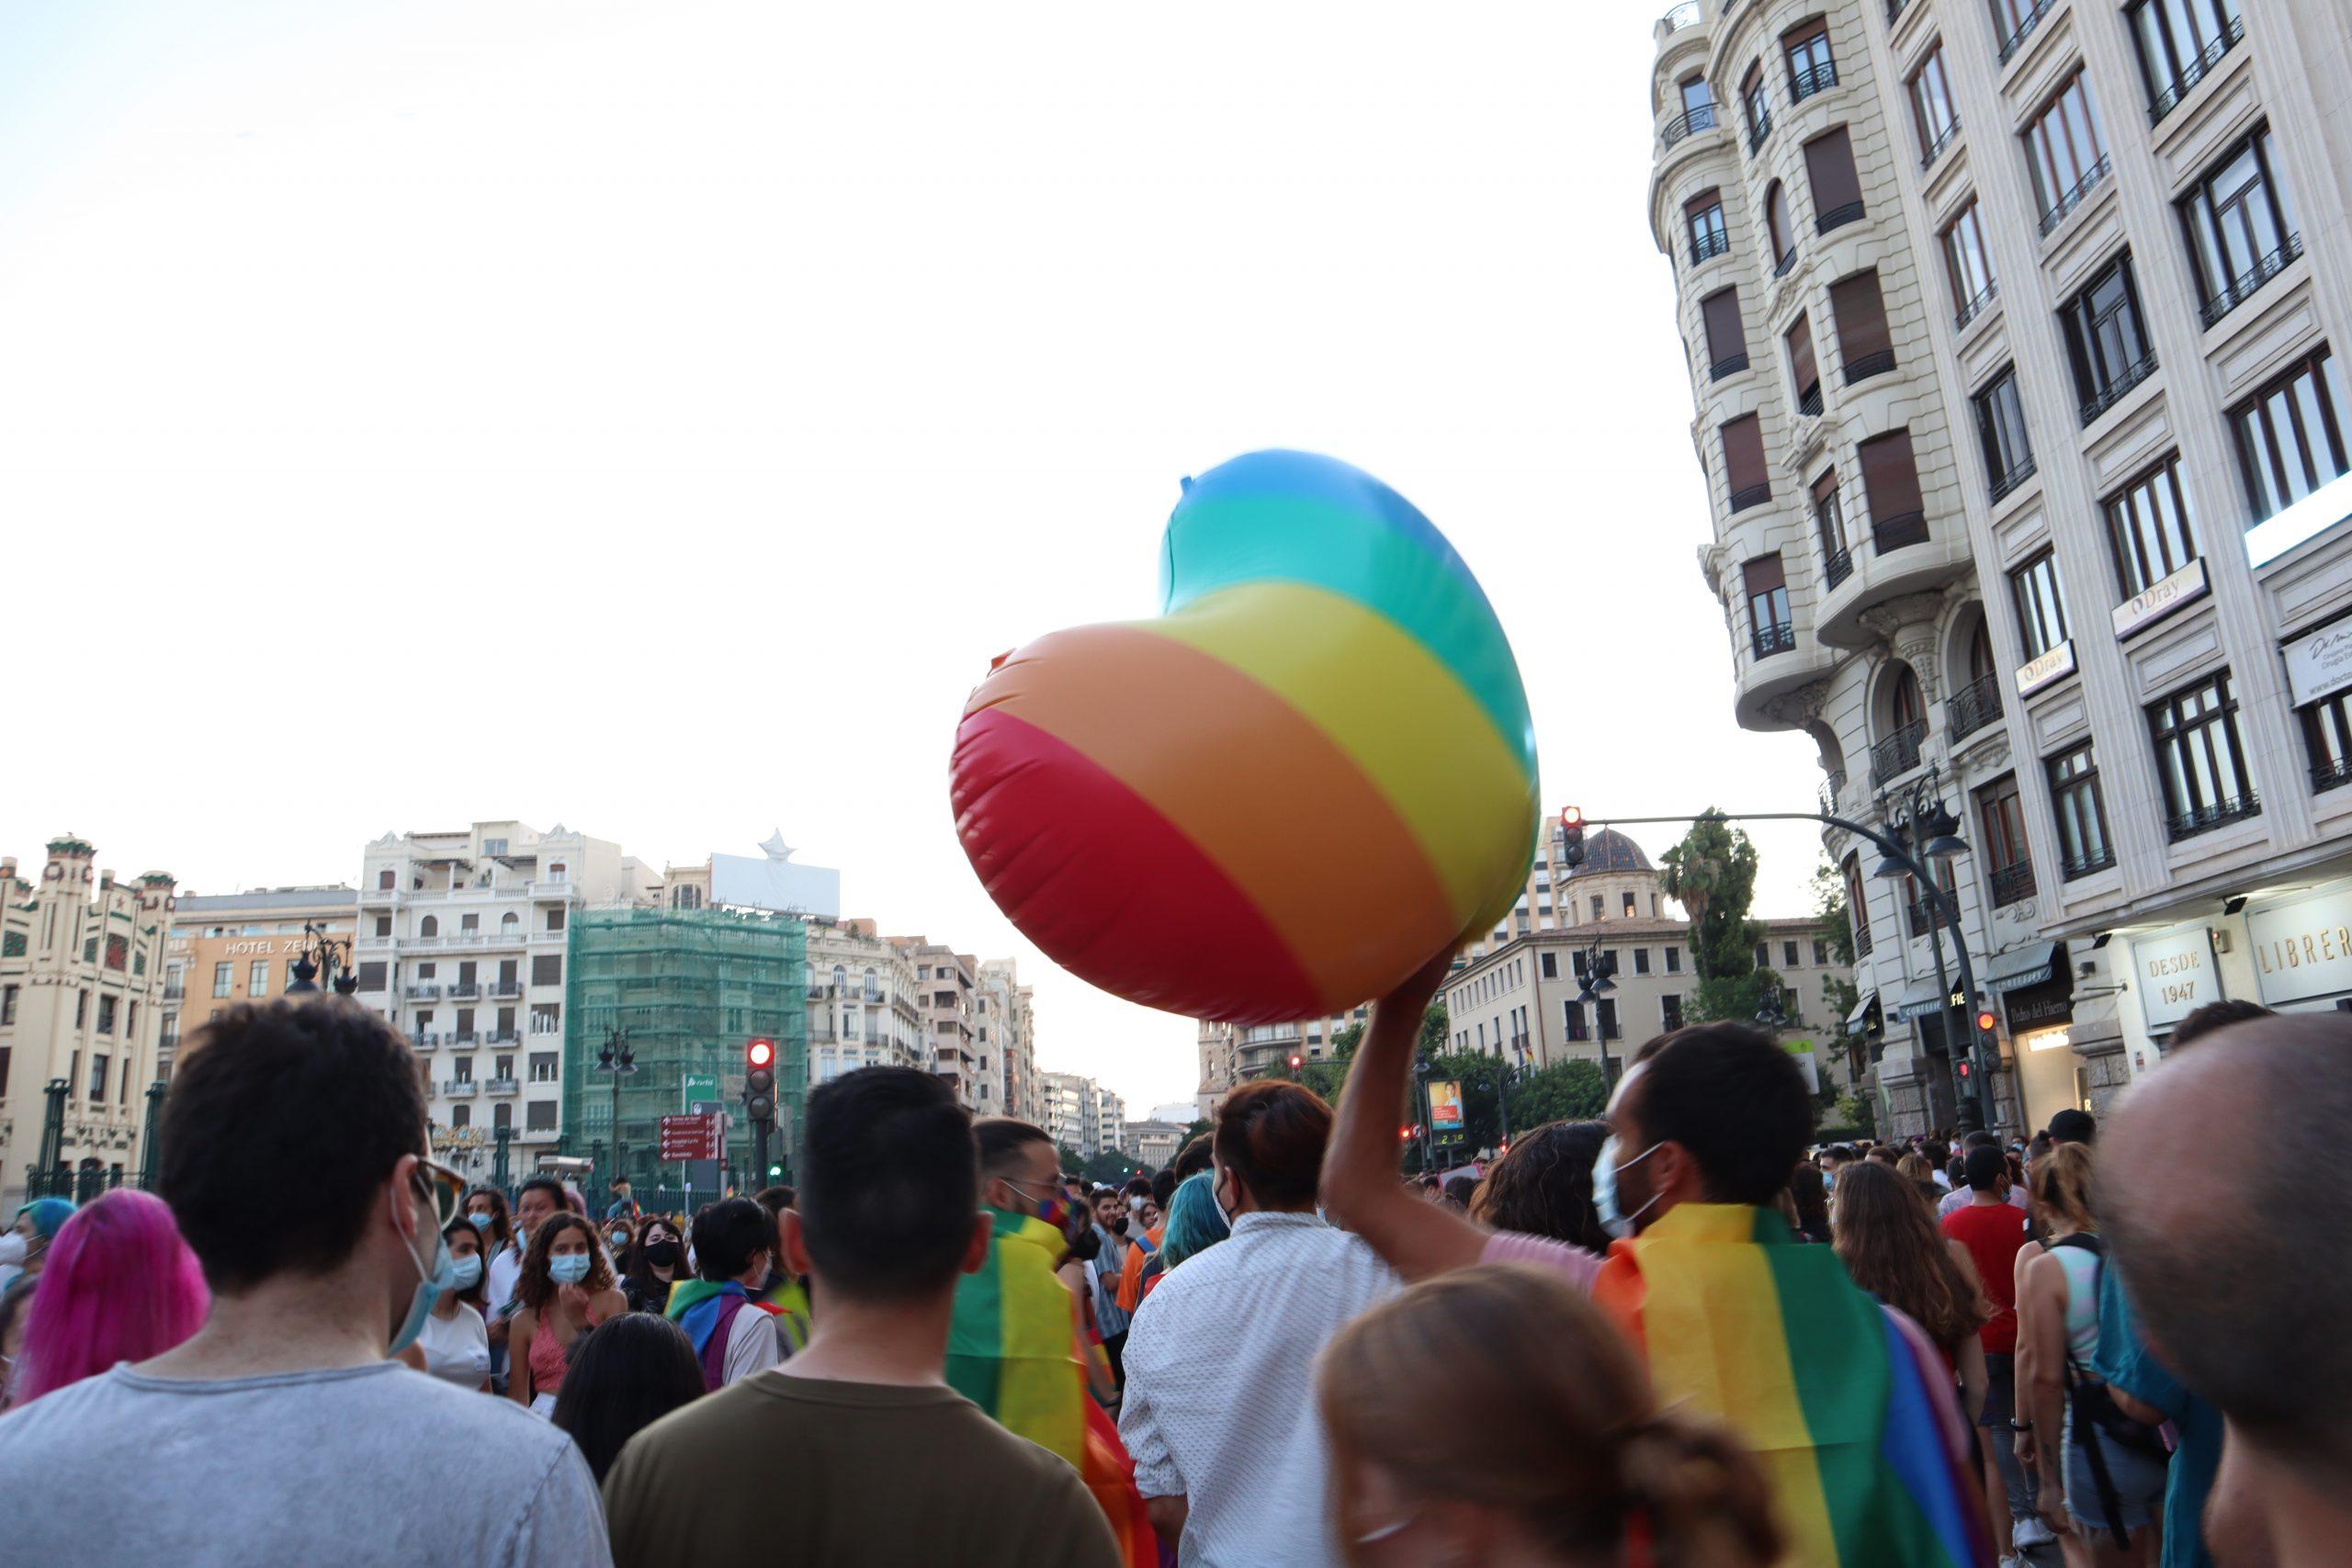 Marching for pride in Valencia, an LGBTQ+-friendly destination